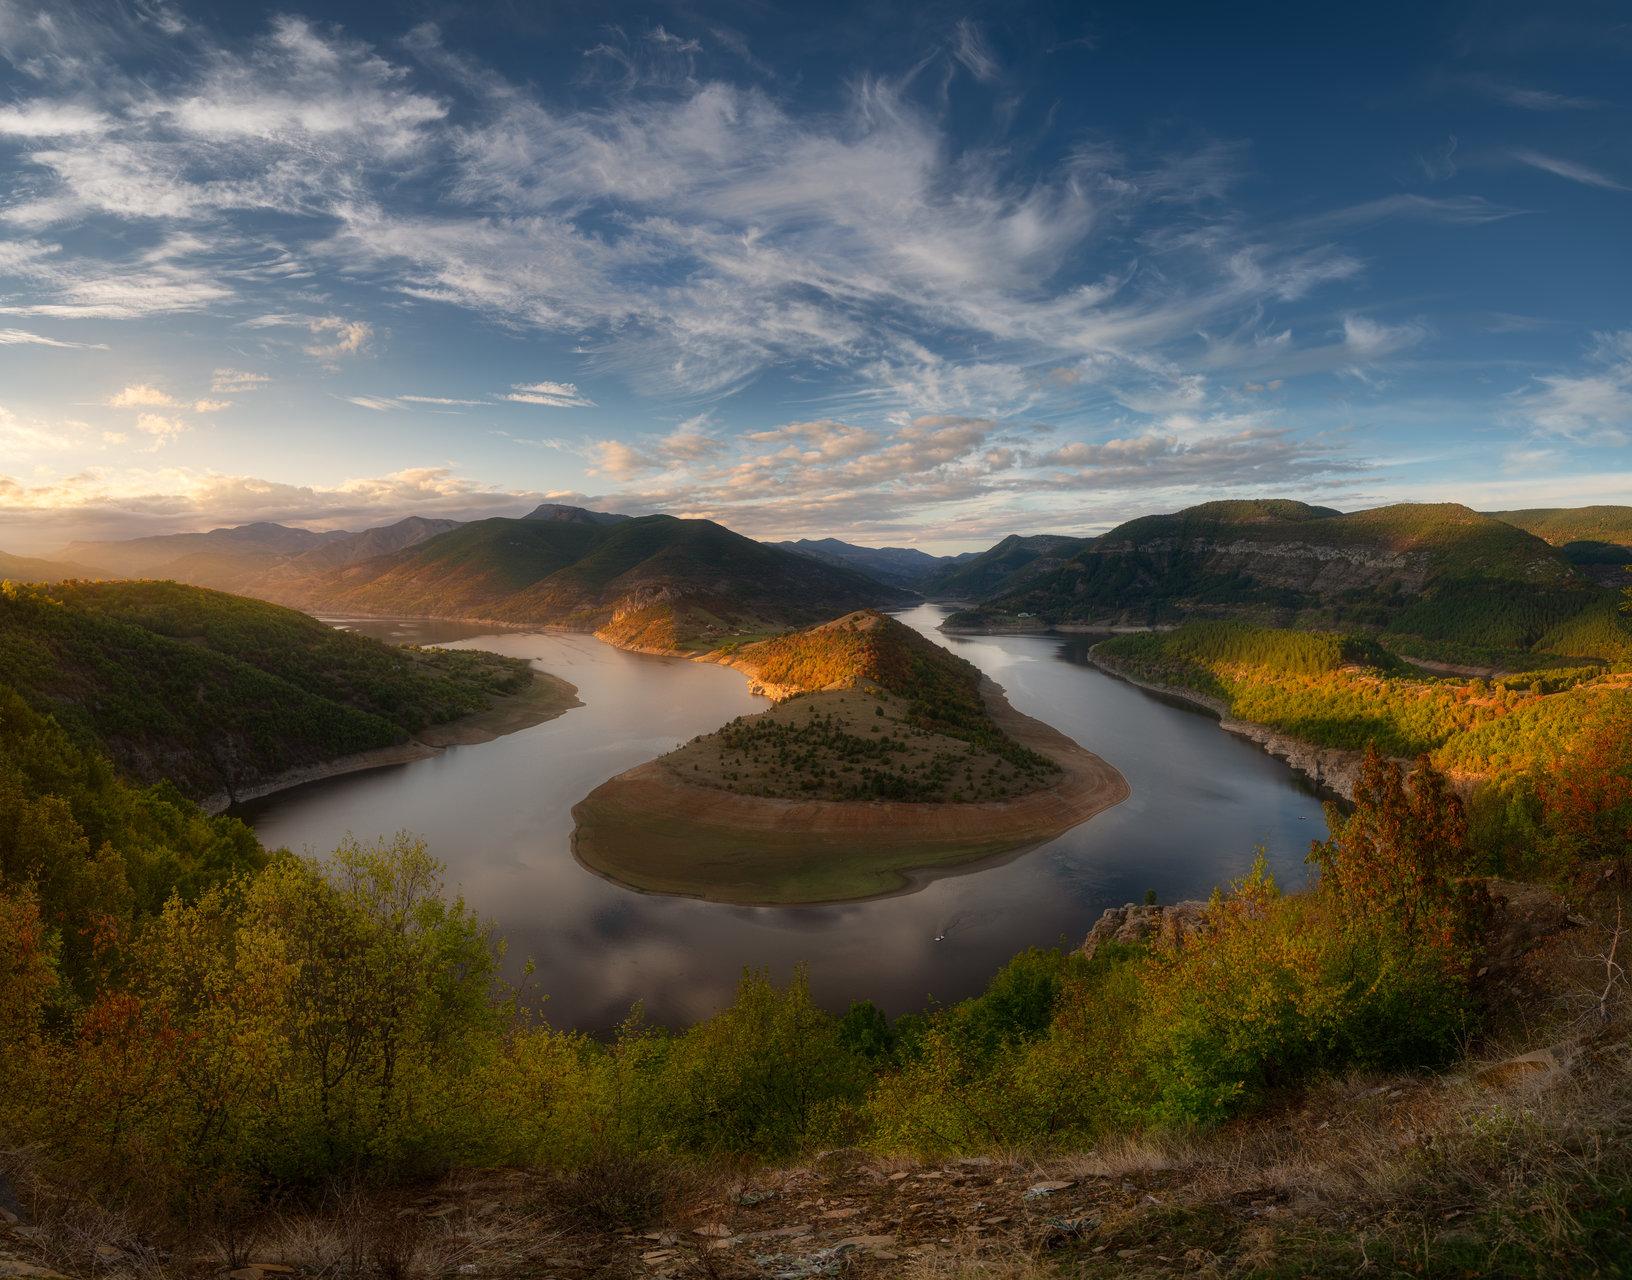 Завоят на язовир Кърджали | Author Boyko Valchev - boiko90 | PHOTO FORUM